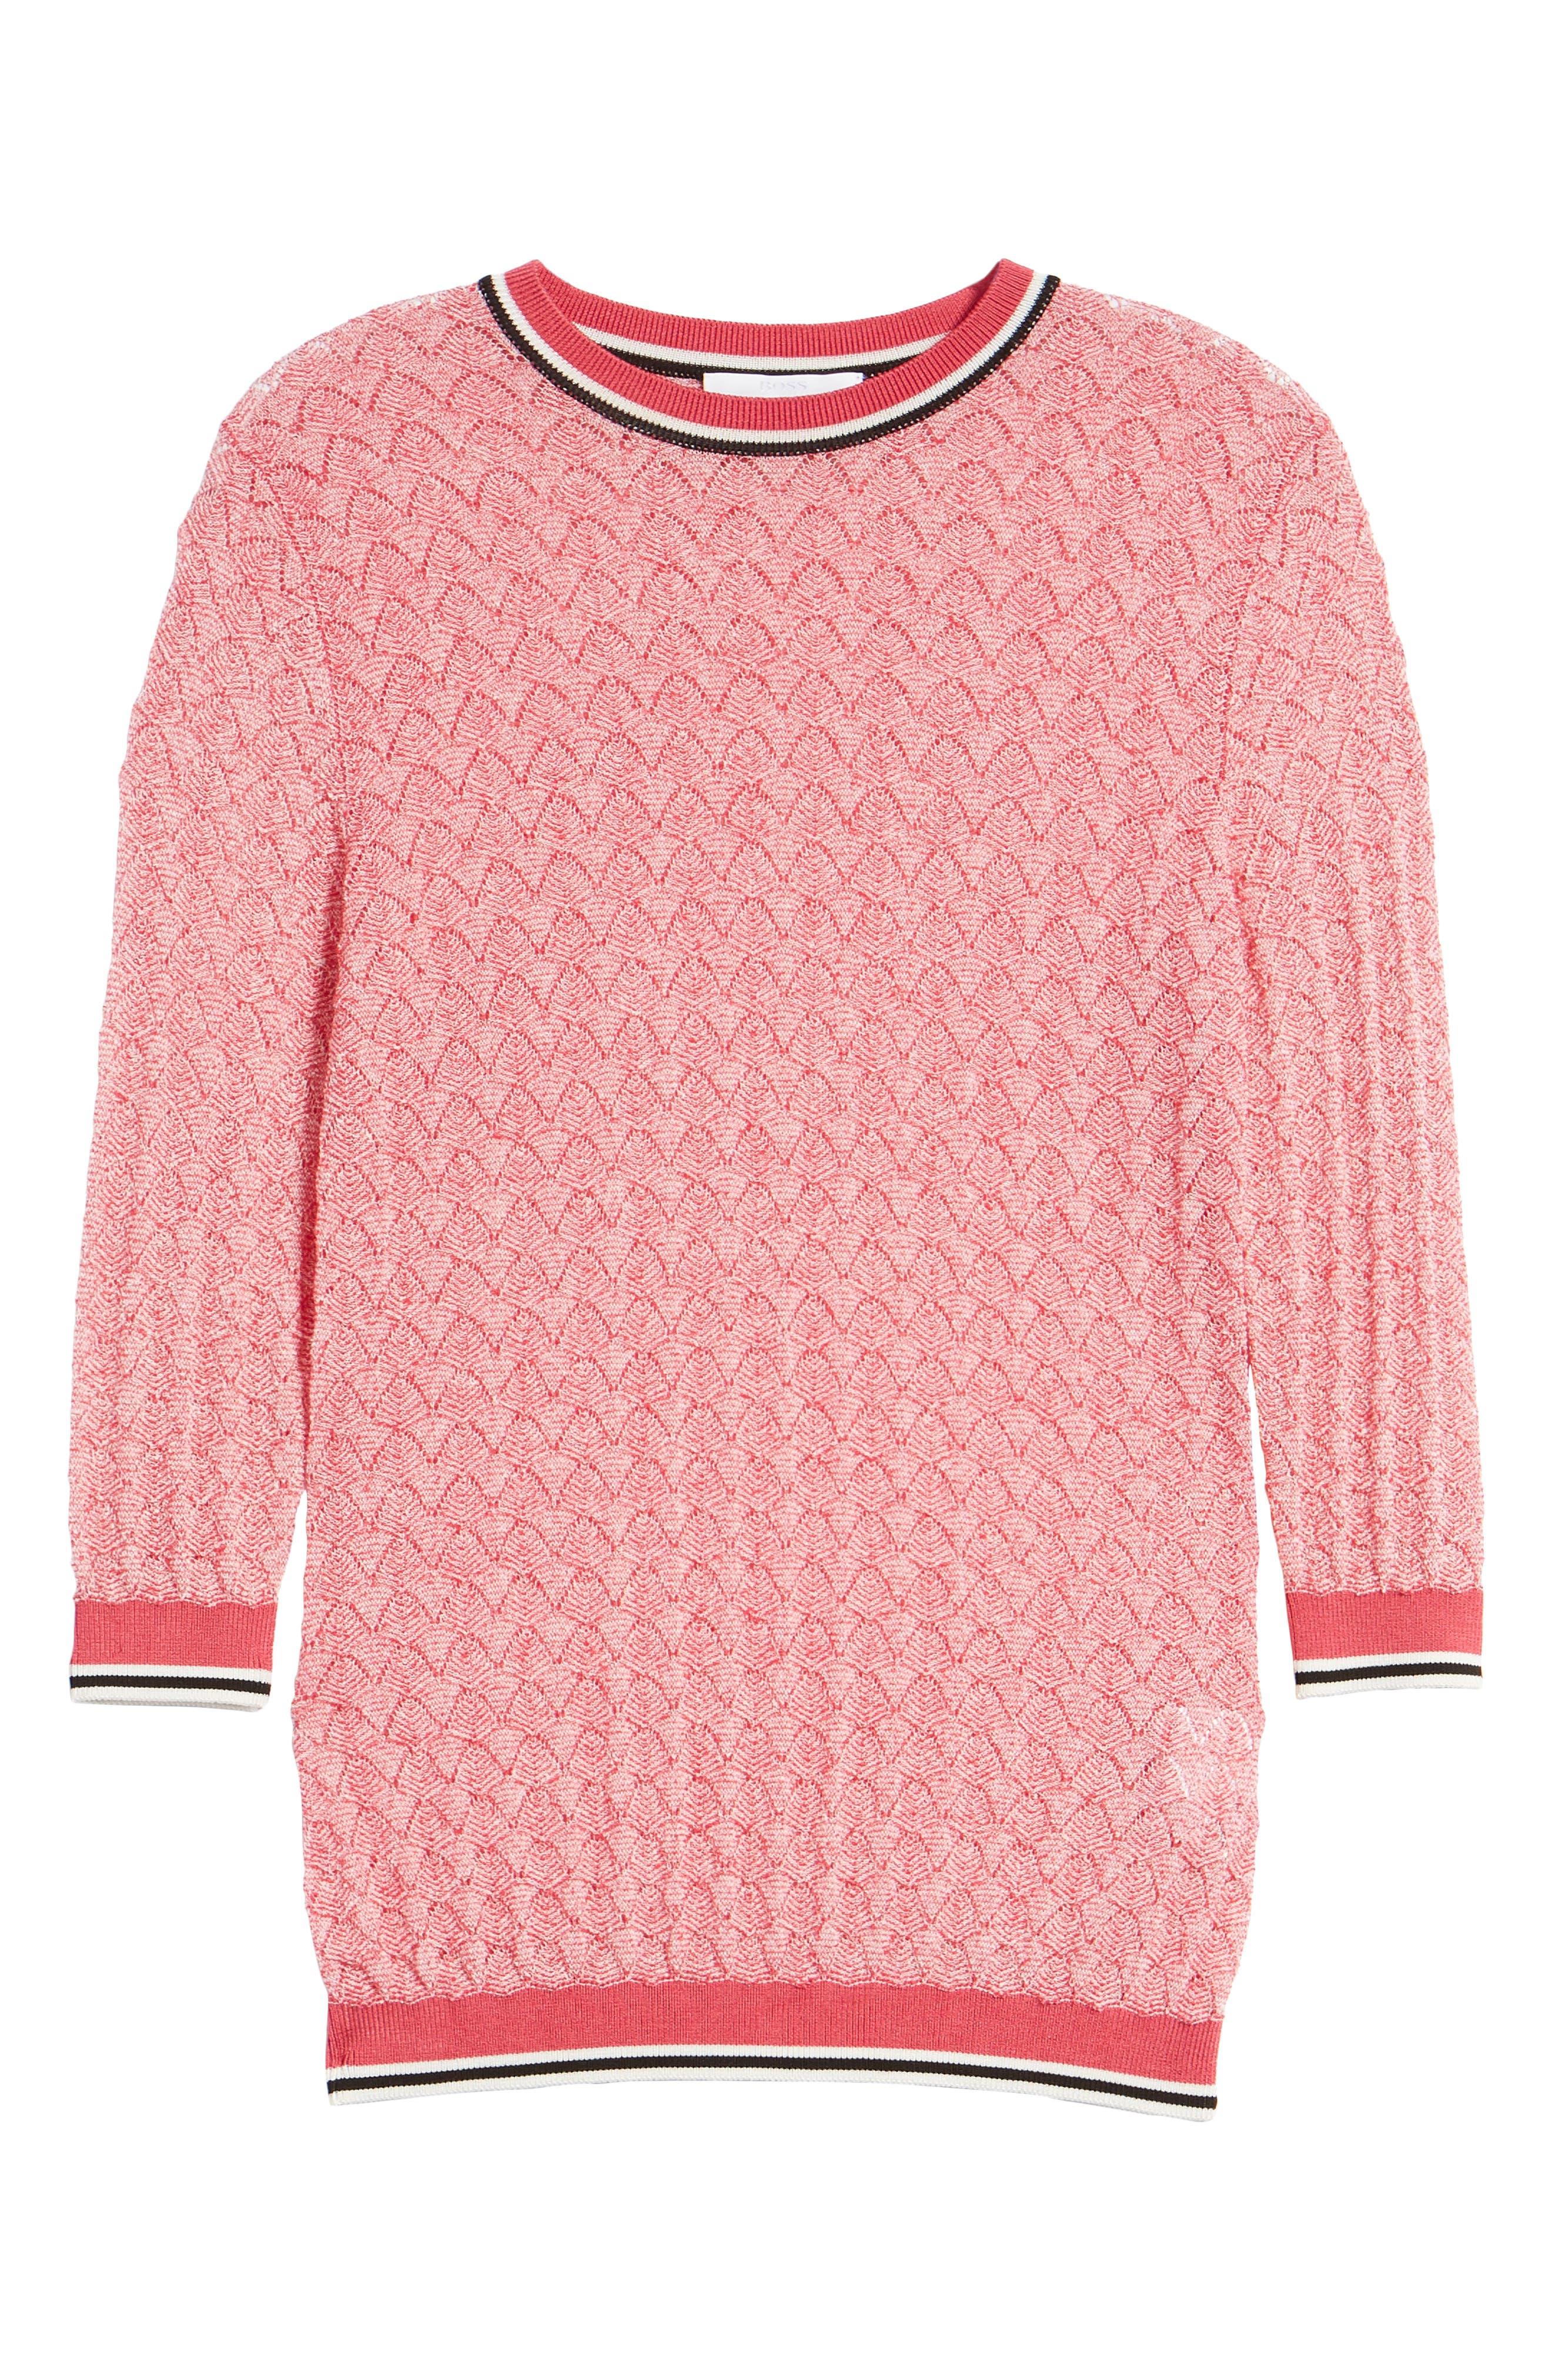 BOSS,                             Basket Weave Sweater,                             Alternate thumbnail 7, color,                             675